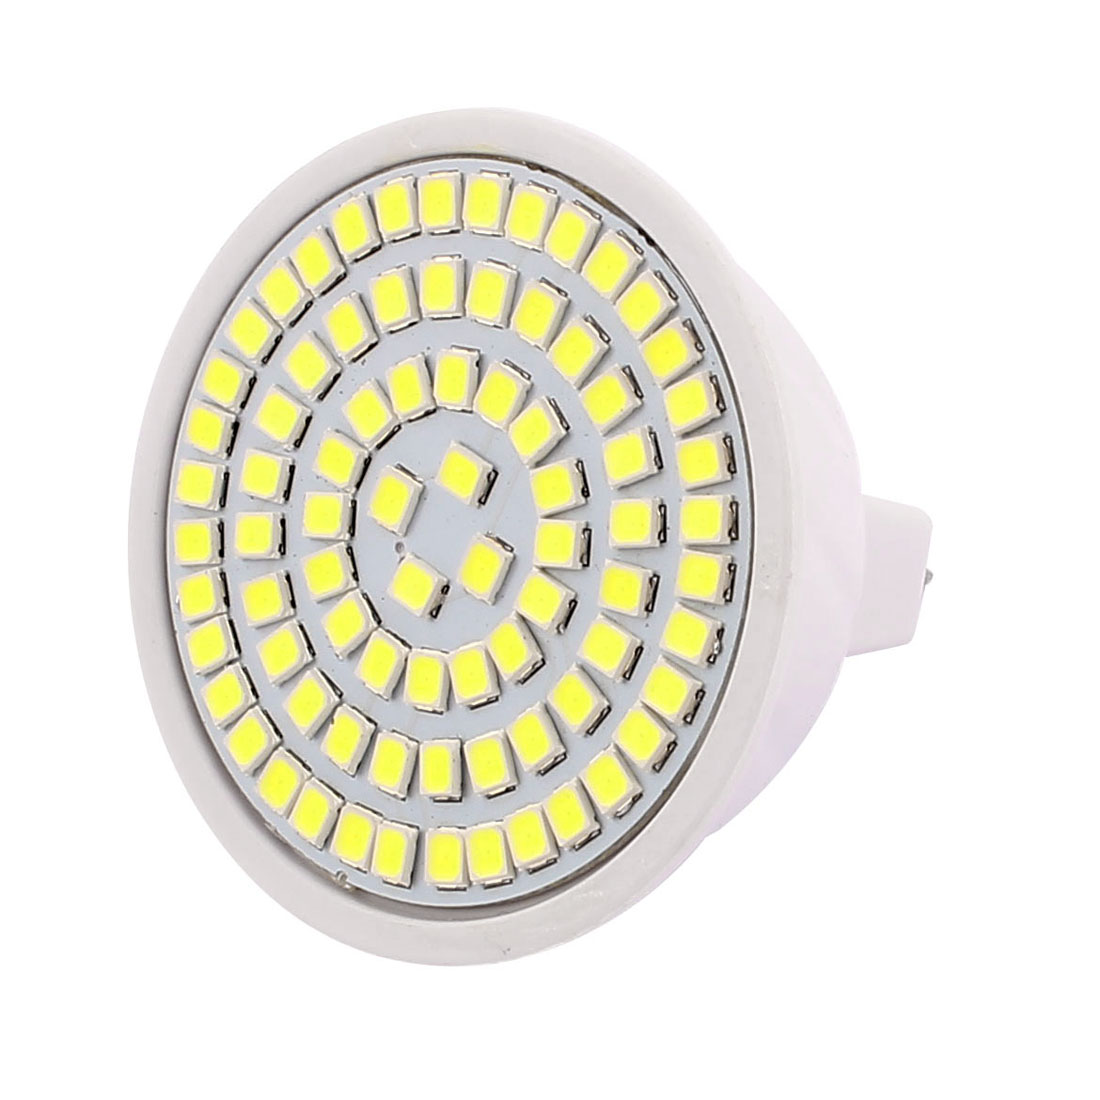 MR16 SMD 2835 80 LEDs Plastic Energy-Saving LED Lamp Bulb White AC 110V 8W